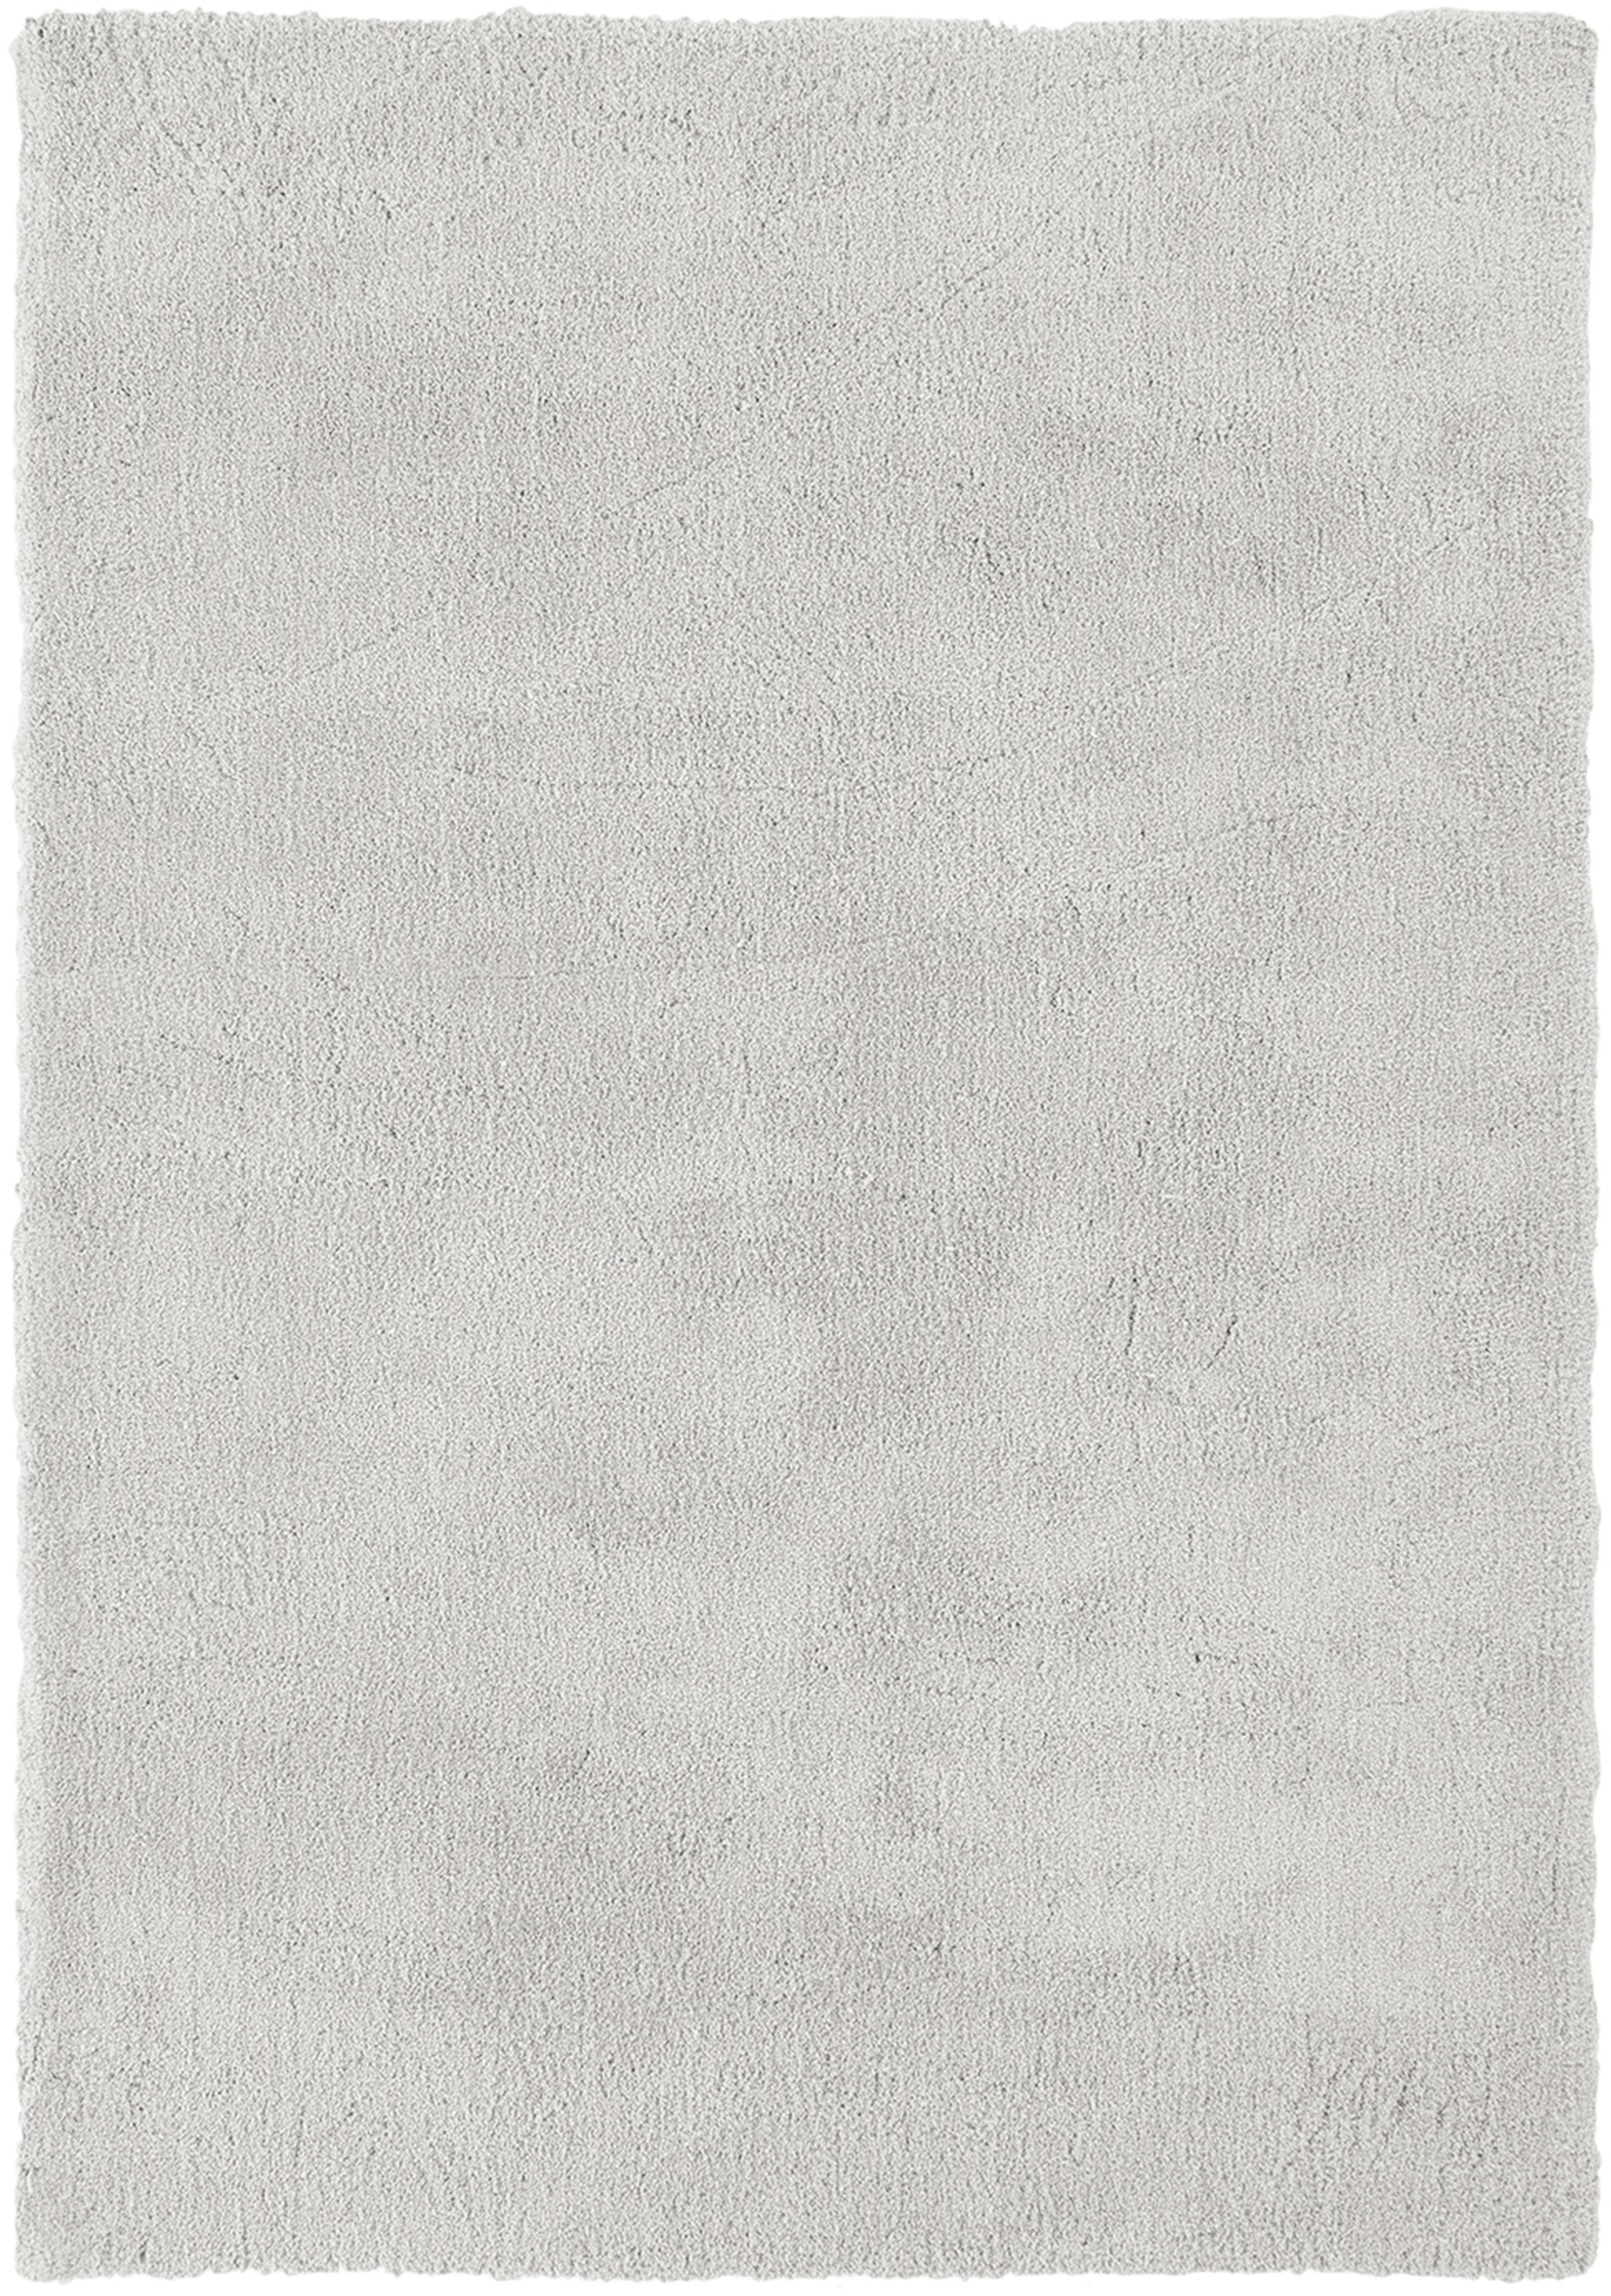 Alfombra de pelo largo Leighton, Parte superior: 100%poliéster (microfibr, Reverso: 100%poliéster, Gris claro, An 200 x L 300 cm (Tamaño L)